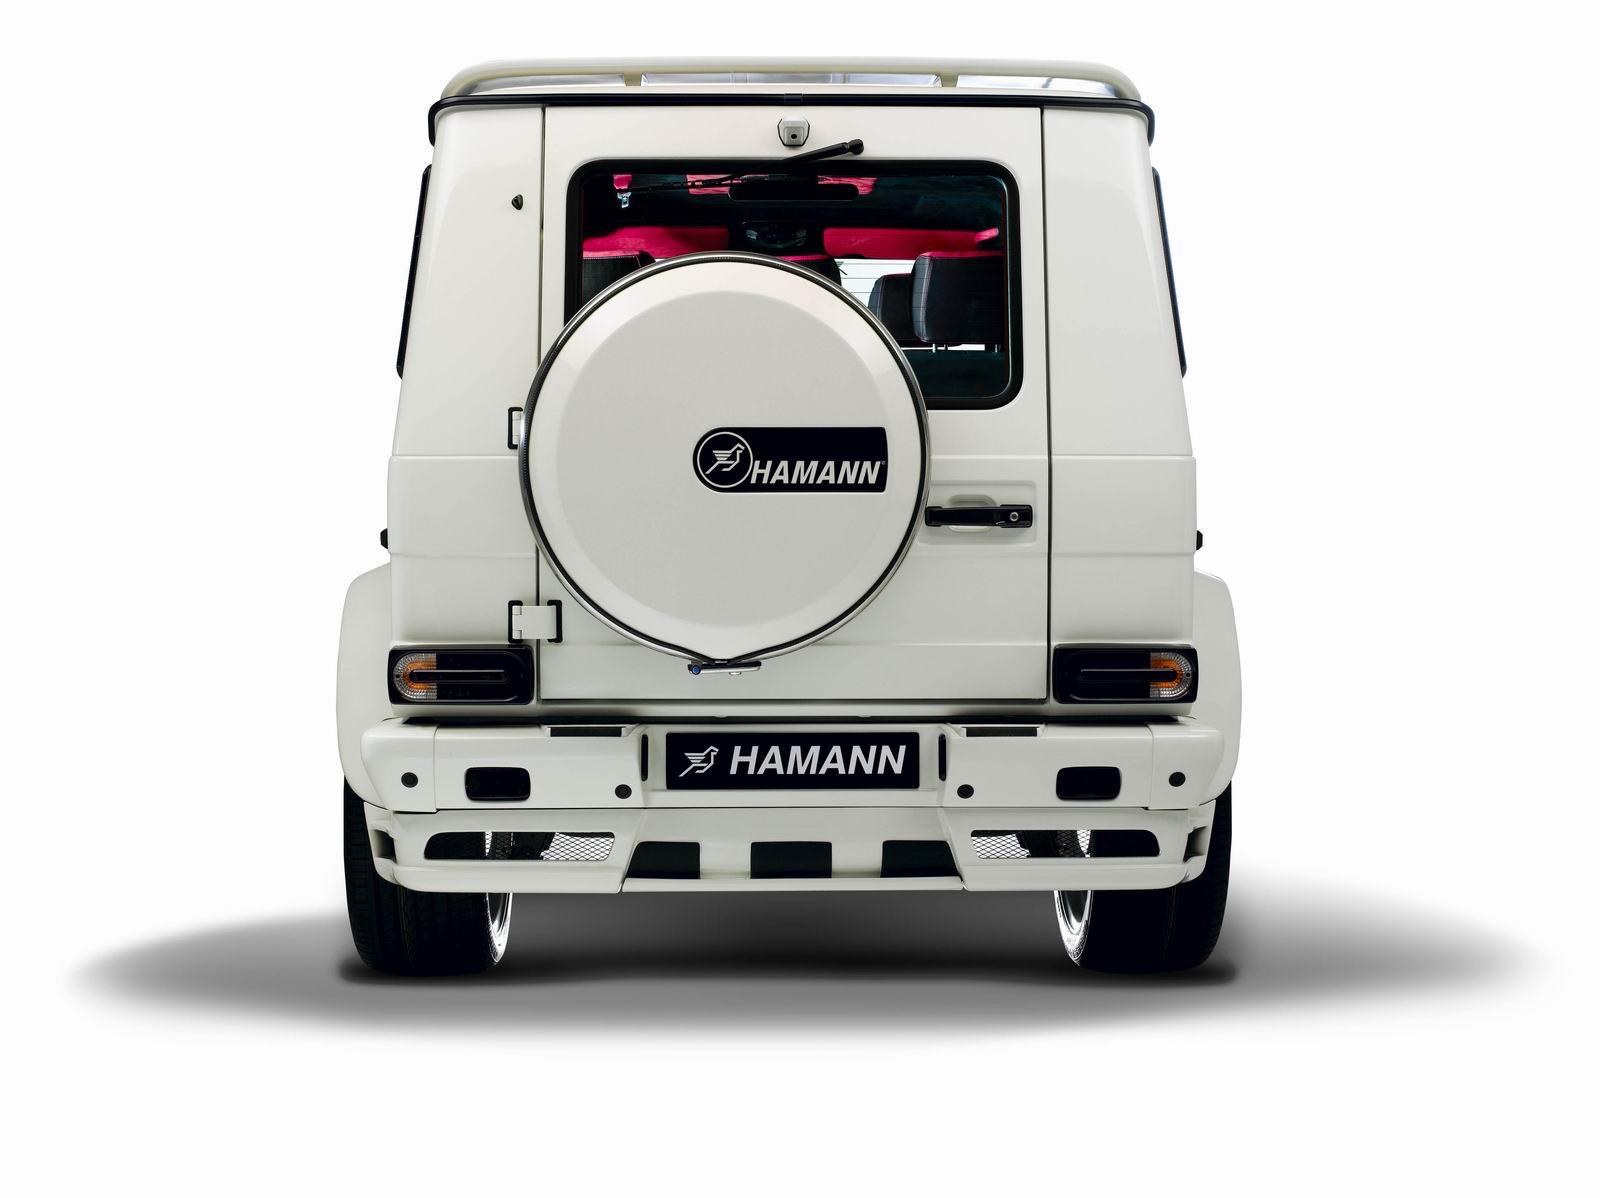 Mercedes G55 AMG by Hamann - Mercedes G55 AMG by Hamann